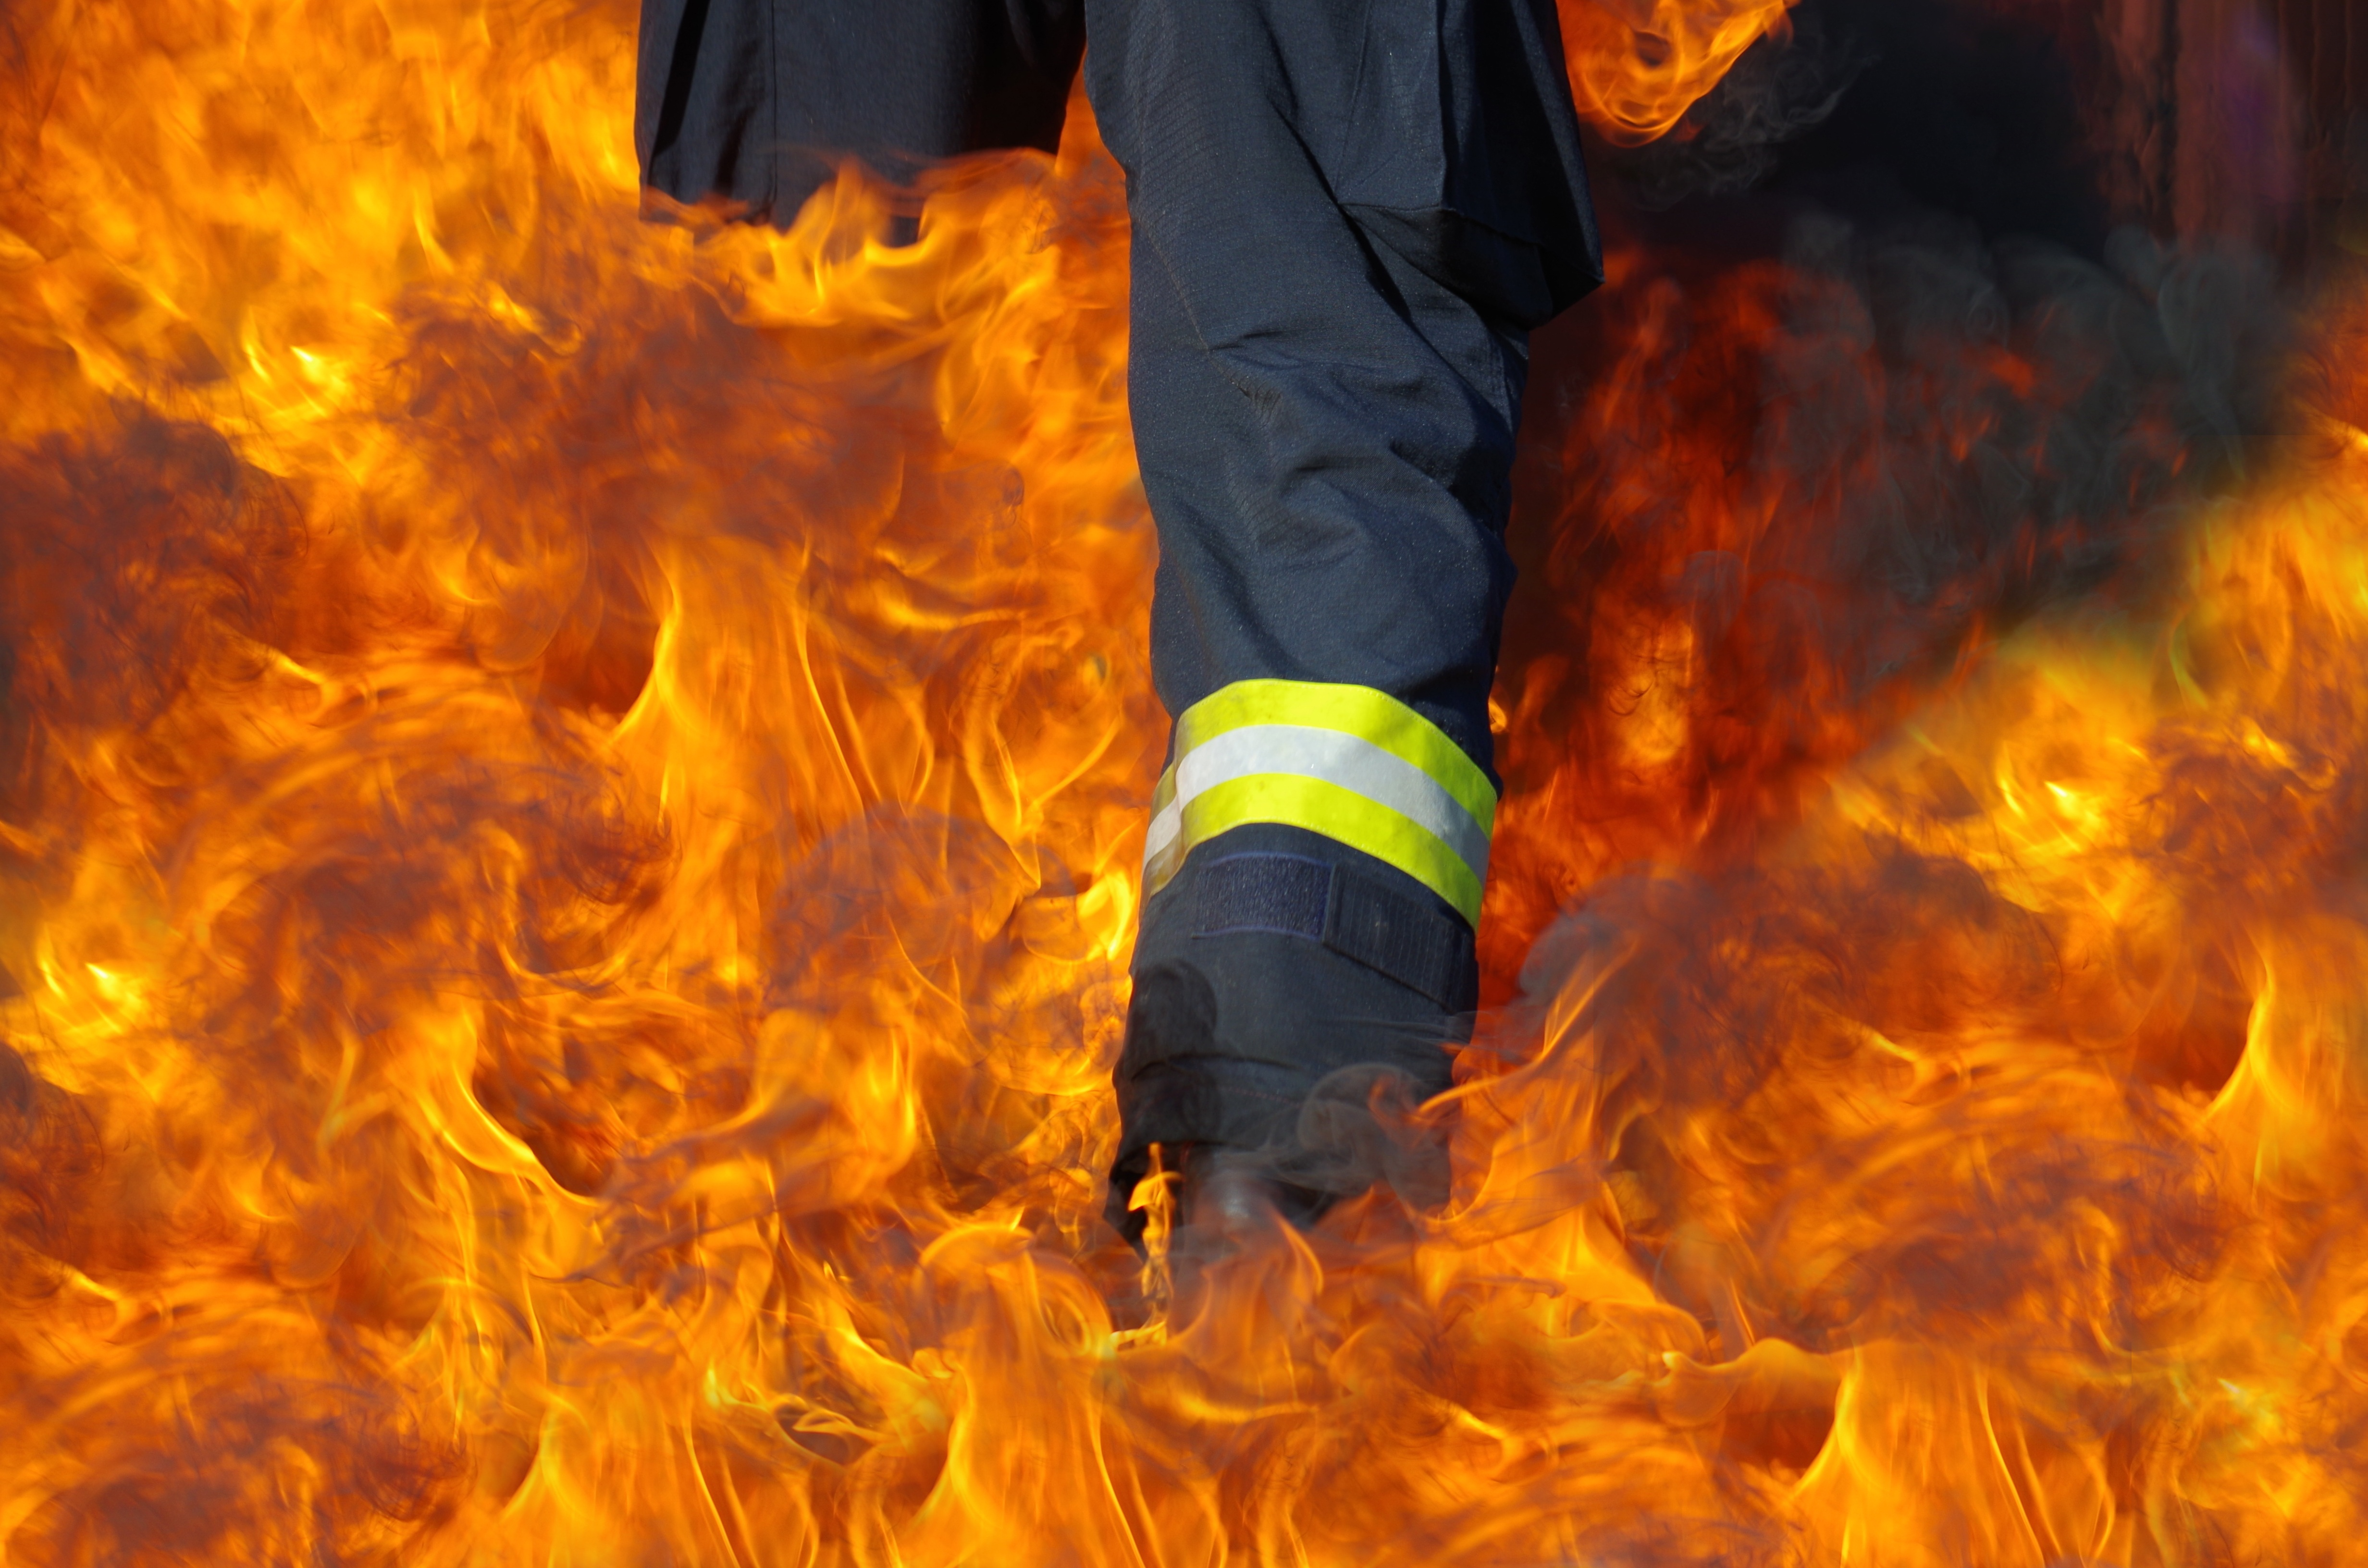 flame-fire-bonfire-hot-fireman-screenshot-to-walk-1036682